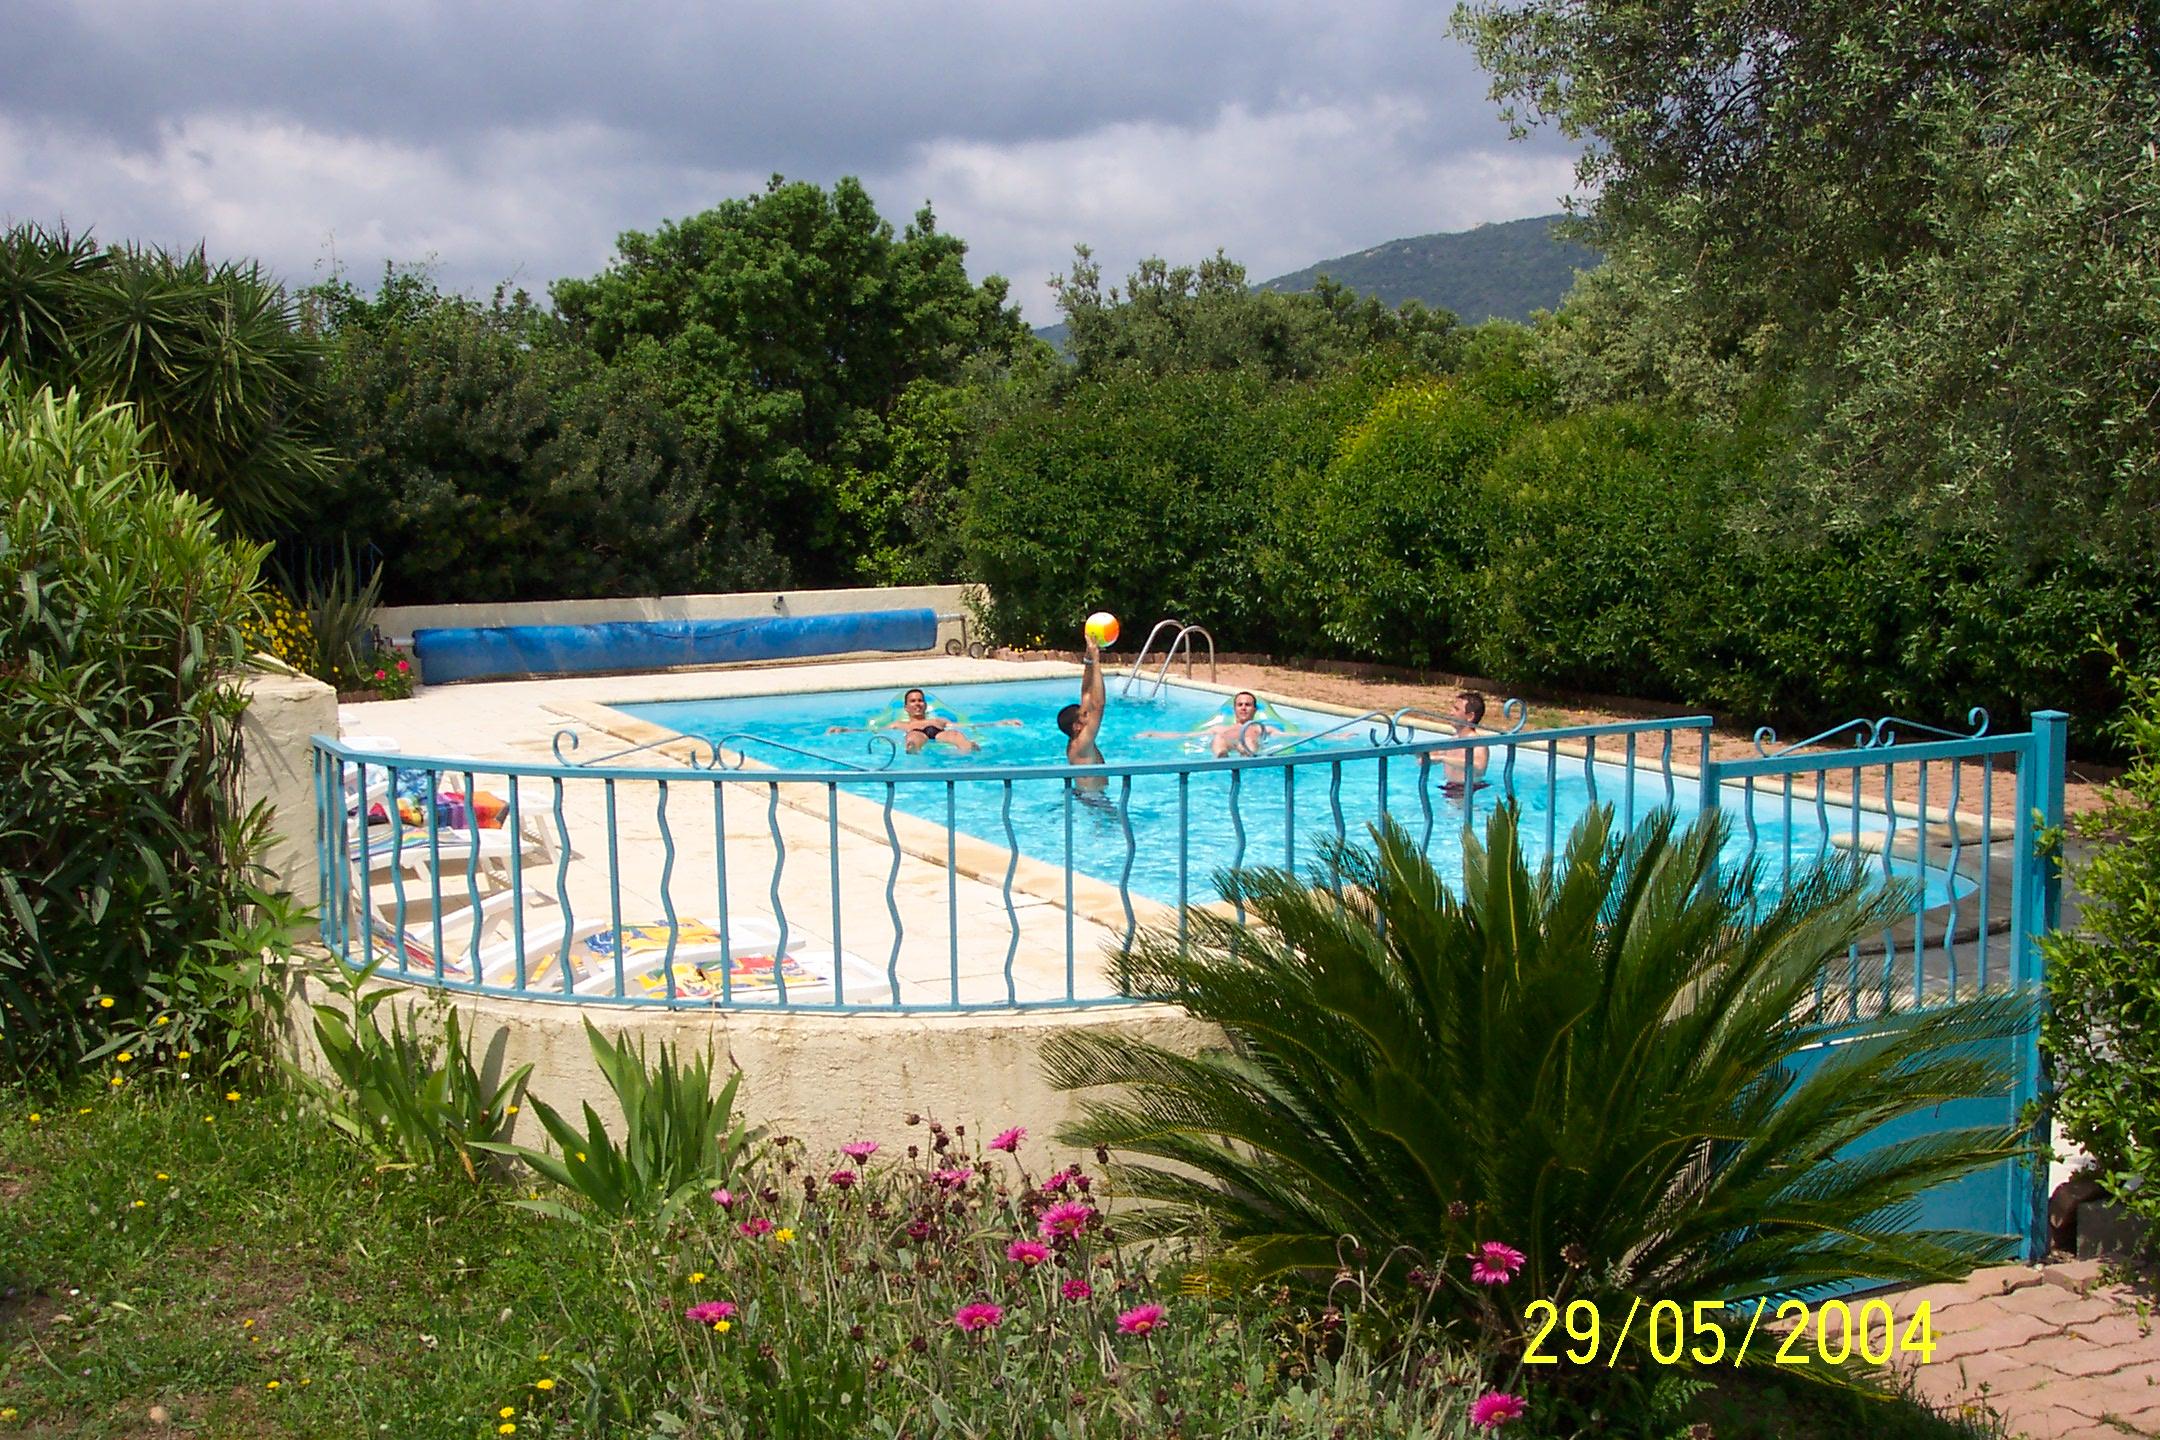 Corse location piscine - Piscine san marco ...